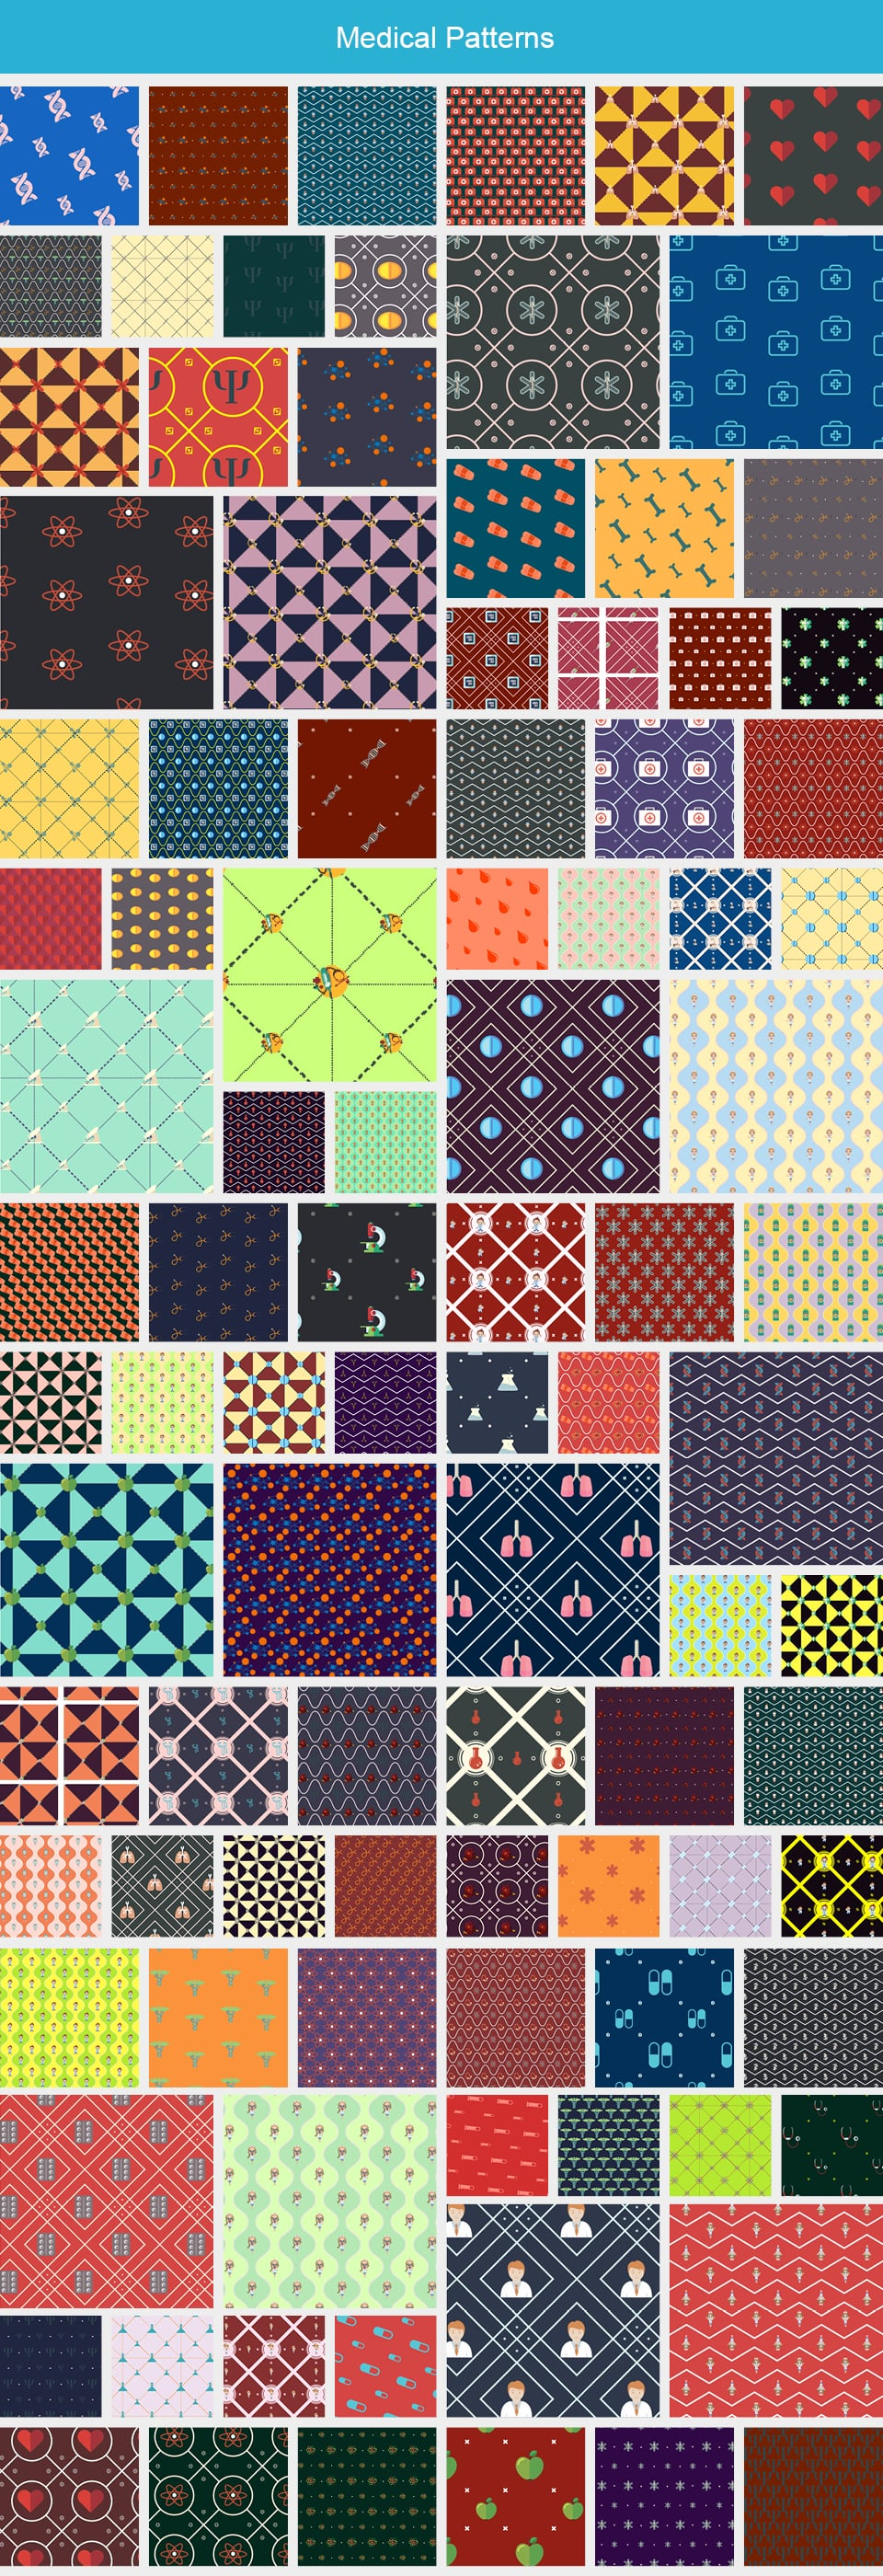 Modern Pattern Designs - Mega Bundle with 2000 Patterns - Large Preview Medical